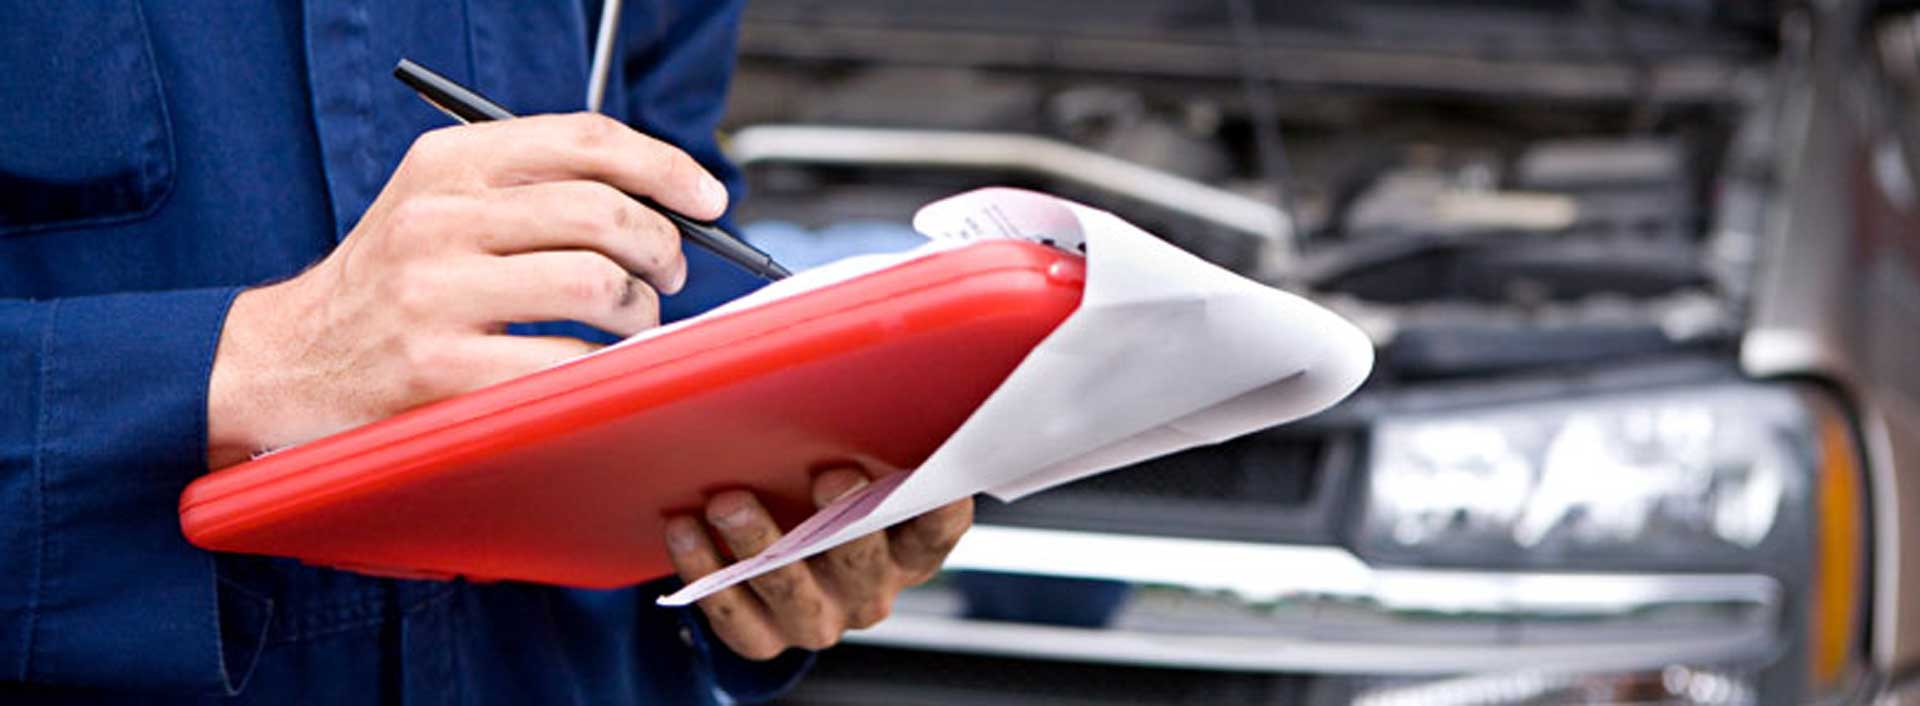 general_car_servicing_surfgaadi